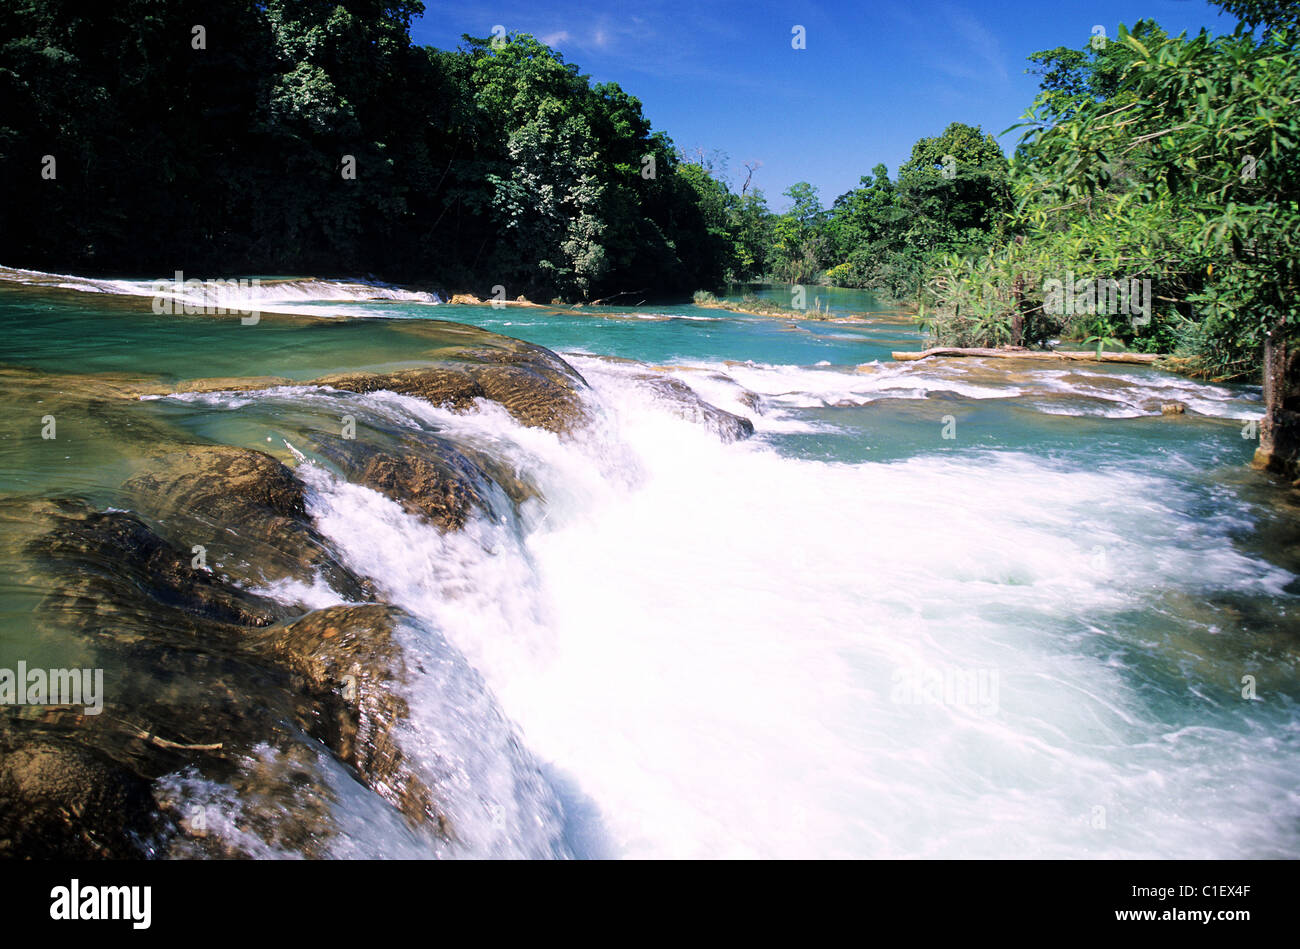 Mexico, Chiapas State, Agua Azul waterfalls - Stock Image